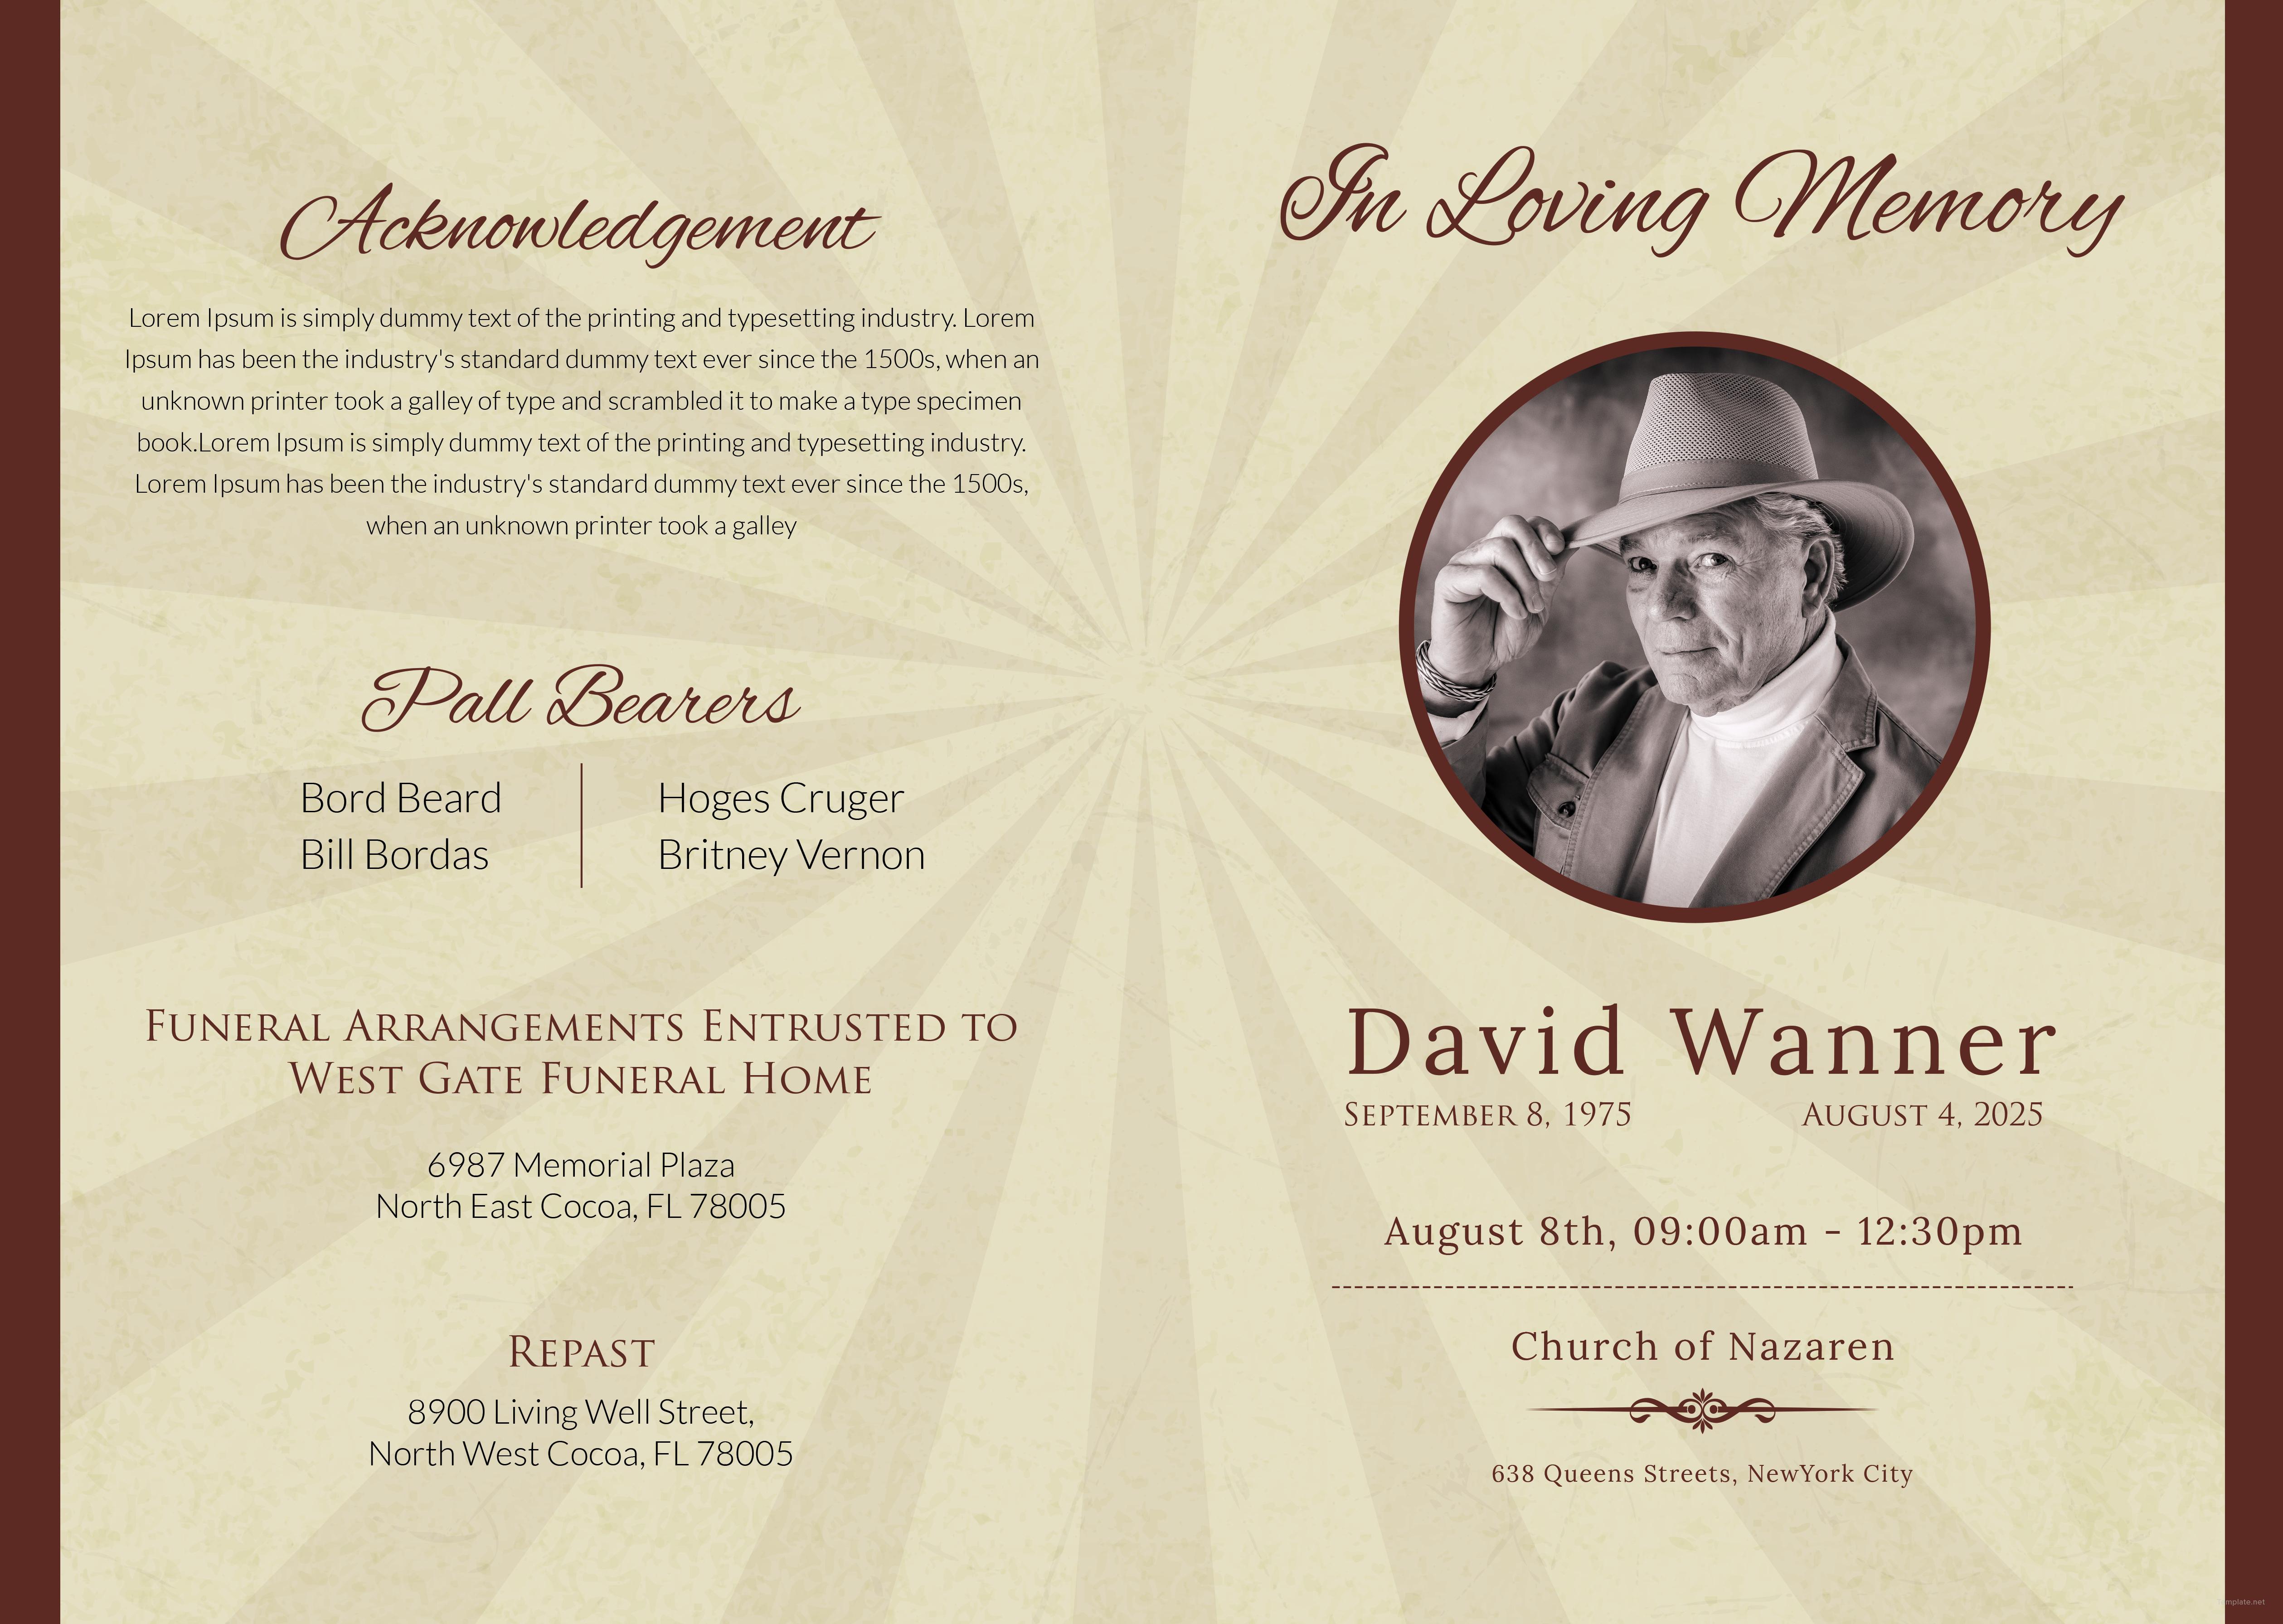 obituary design templates free - Vatoz.atozdevelopment.co